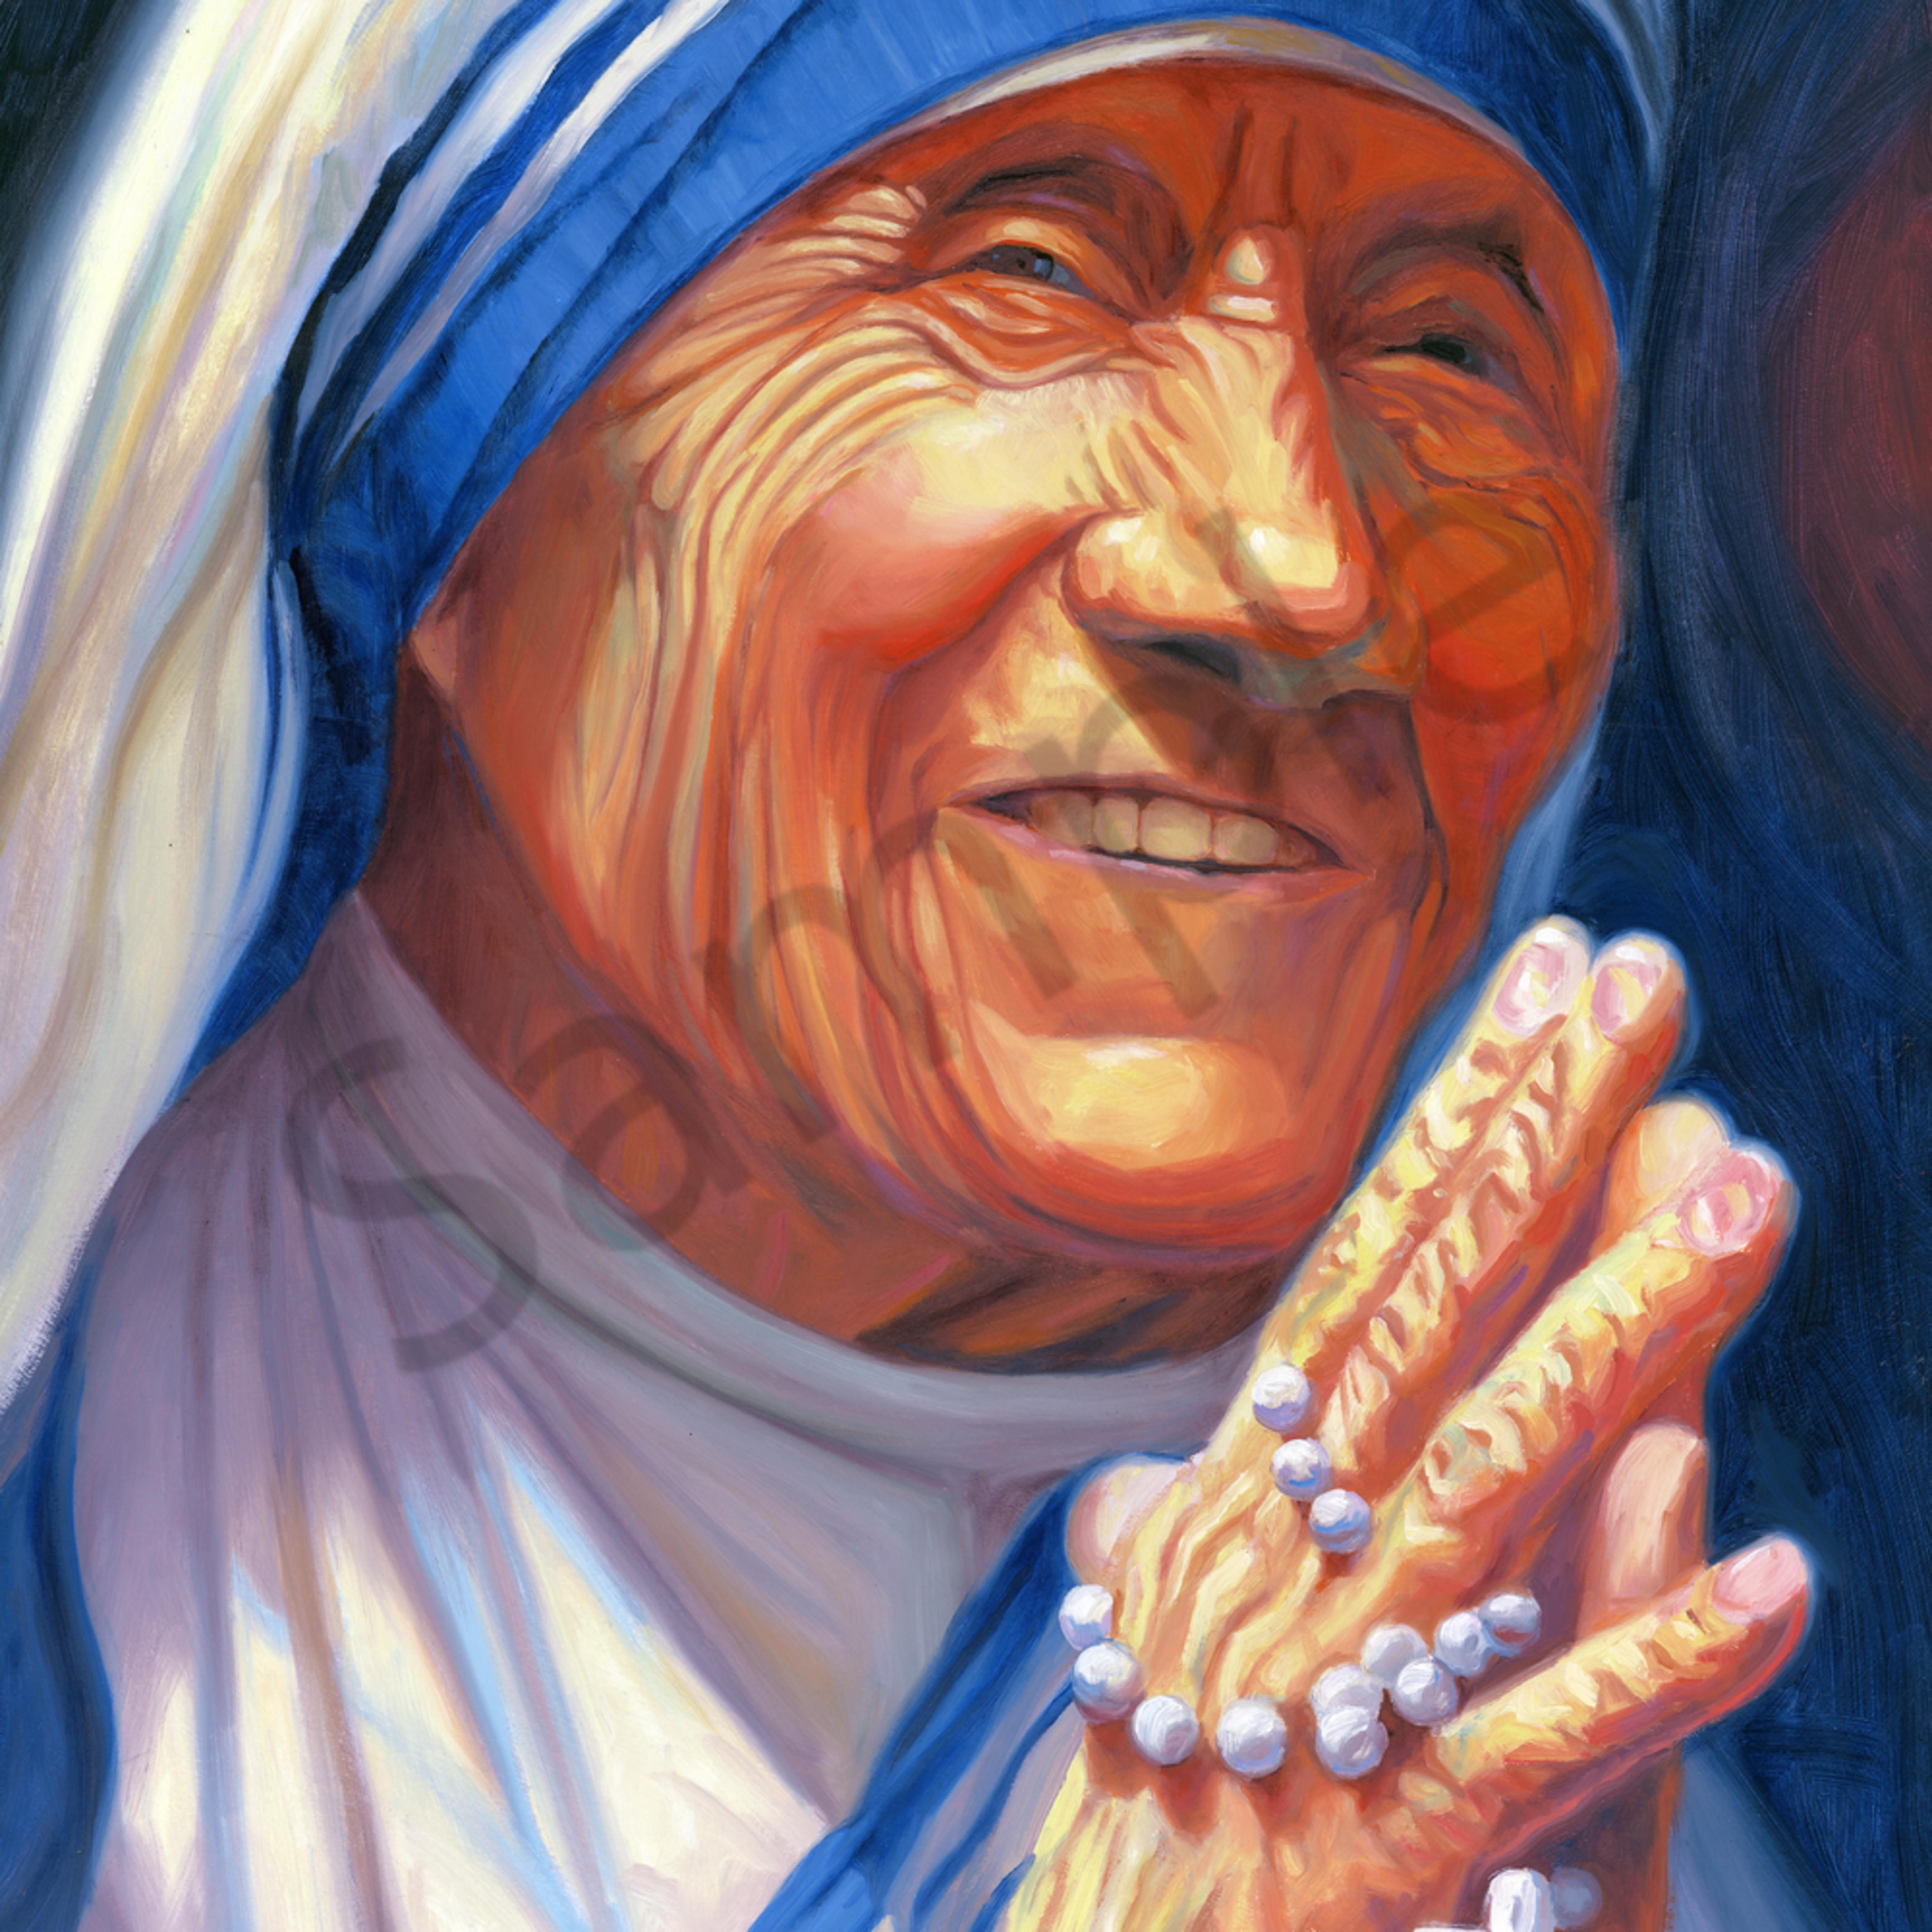 Mother teresa pepcyc